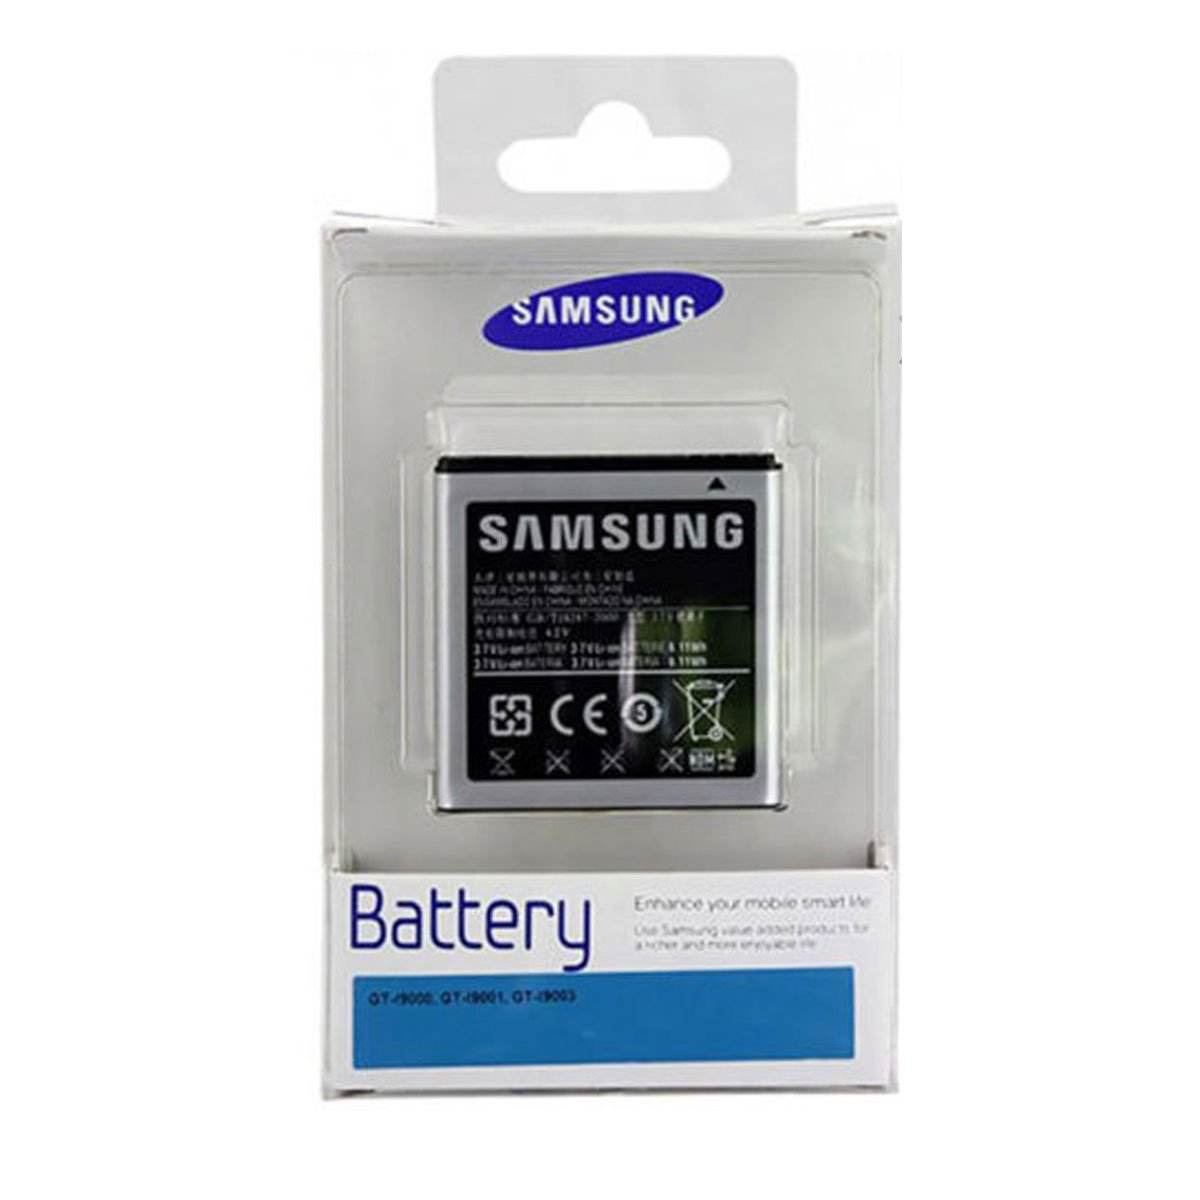 Samsung notebook hoyt6yx - Samsung Ebbg530b Batterie Pour Galaxy Grand Prime